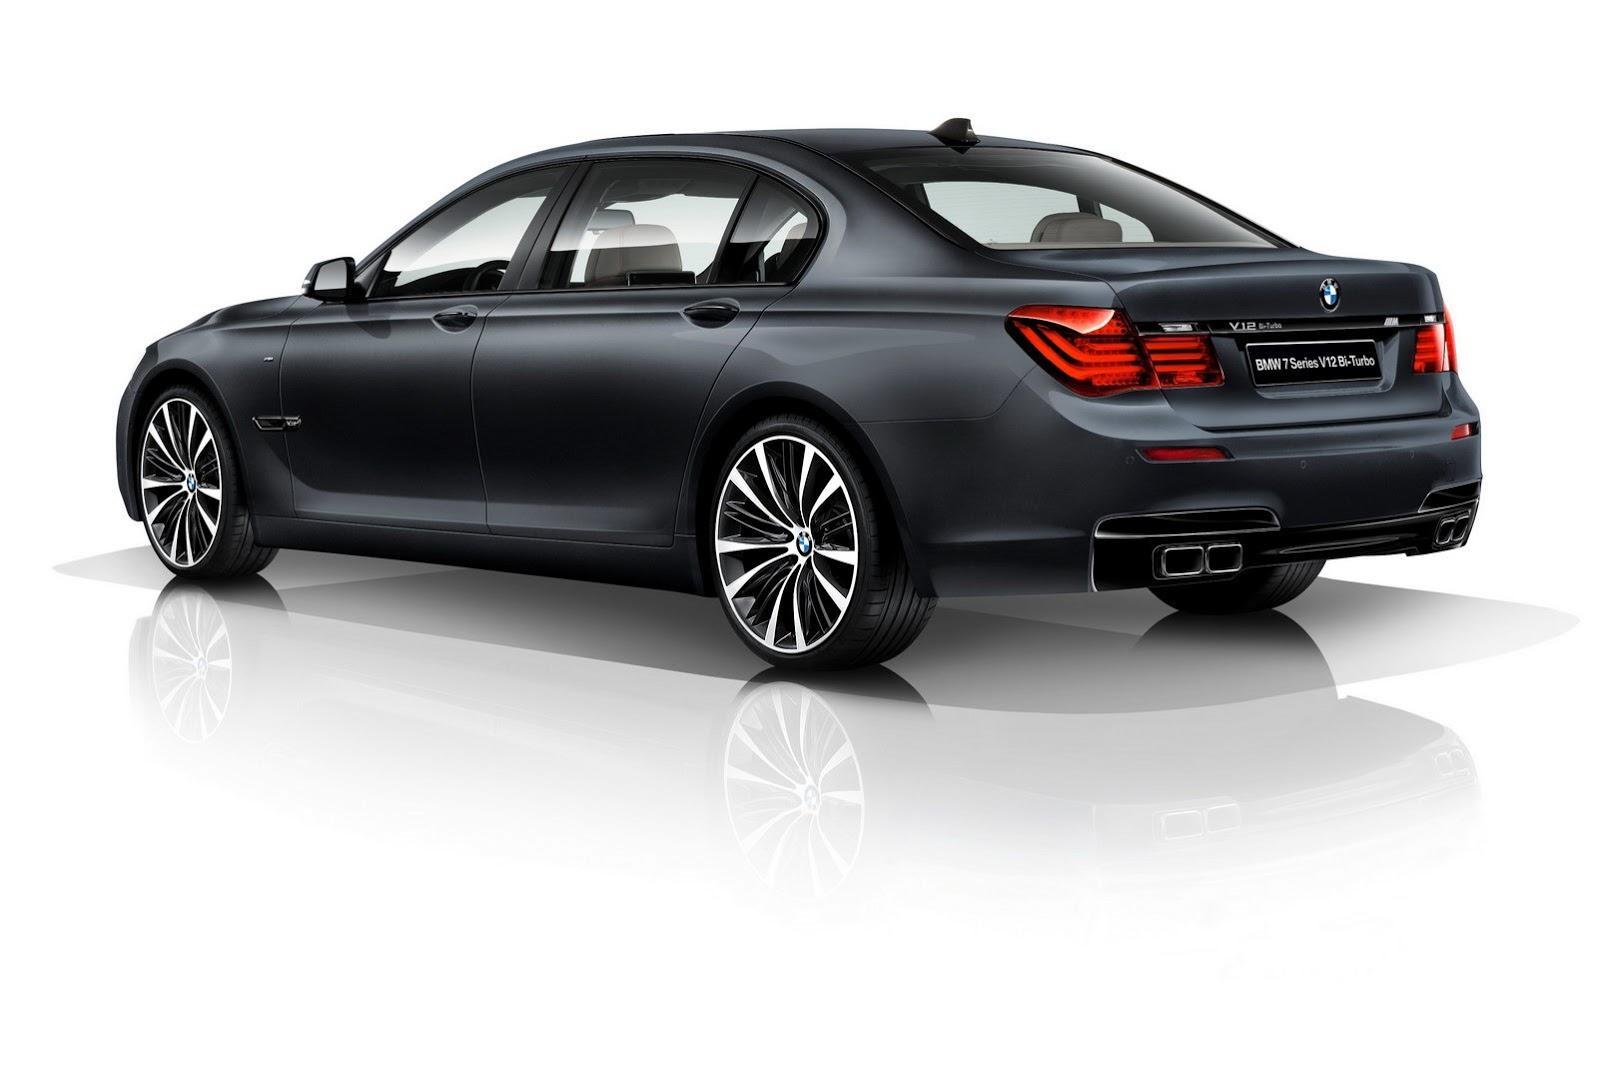 BMW Seria 7 V12 Bi-Turbo Limited Edition - BMW Seria 7 V12 Bi-Turbo Limited Edition